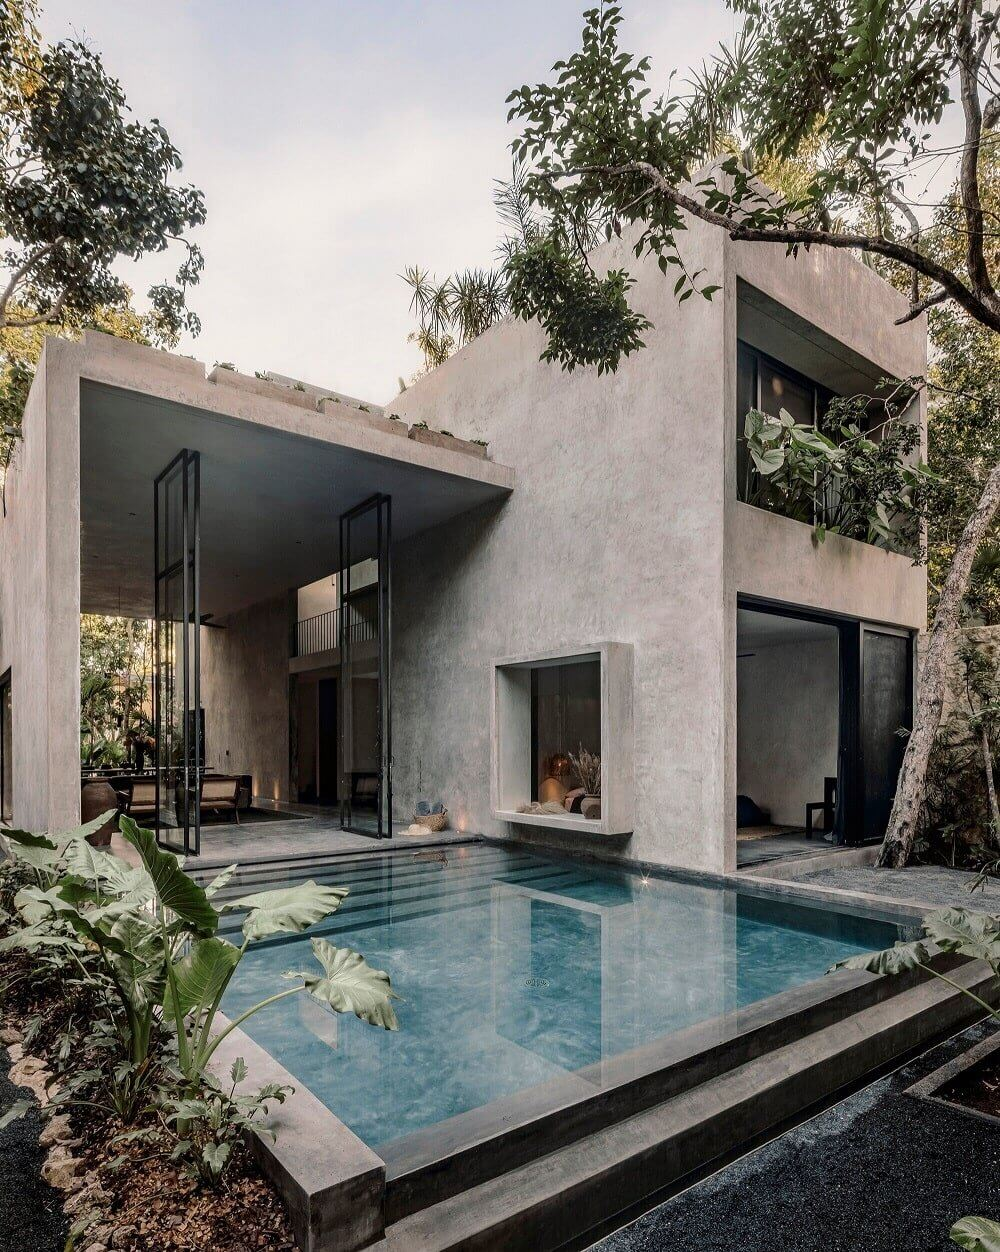 A Modern Architectural Villa in Tulum